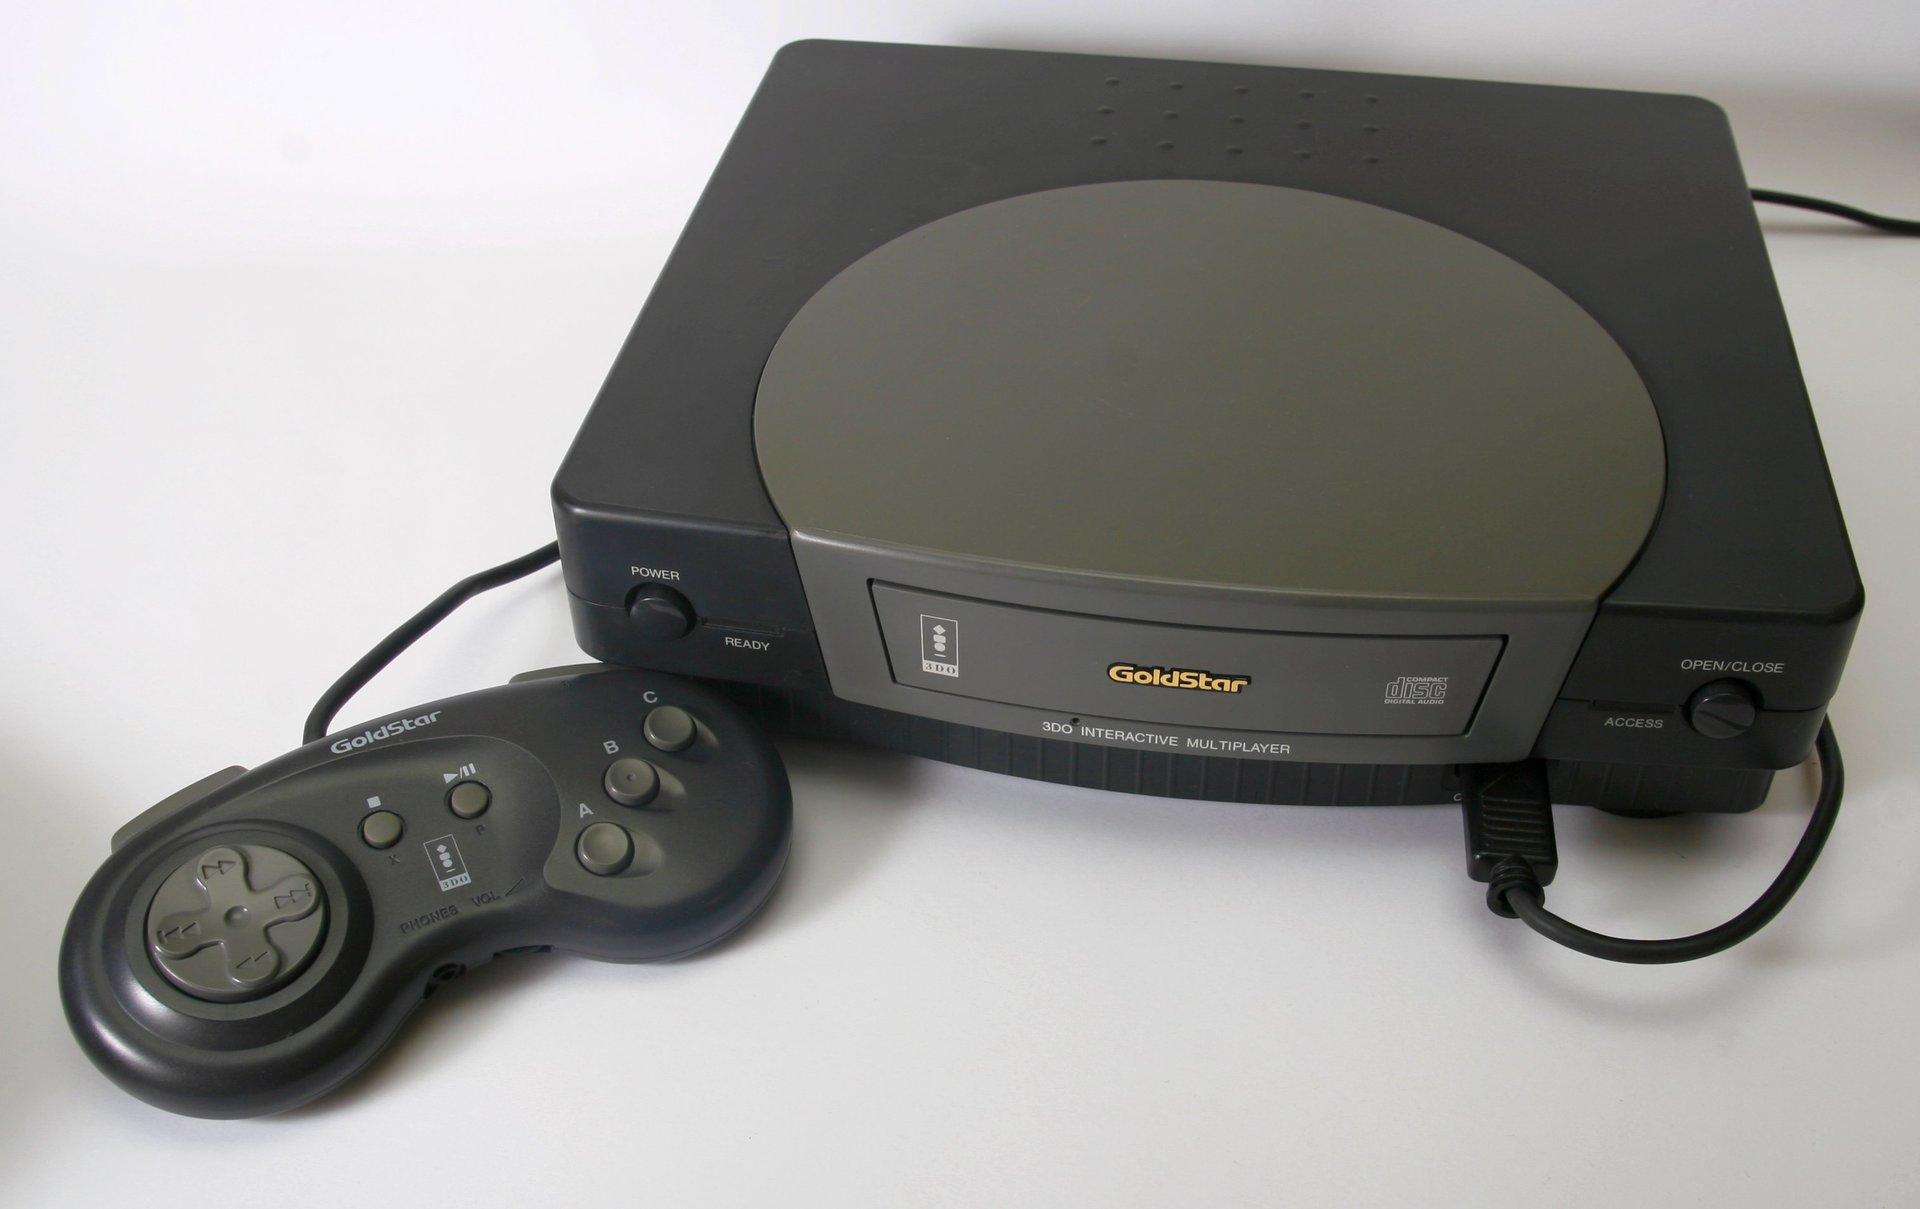 The 3DO Company и 3DO Interactive Multiplayer (Panasonic и не только) - 14